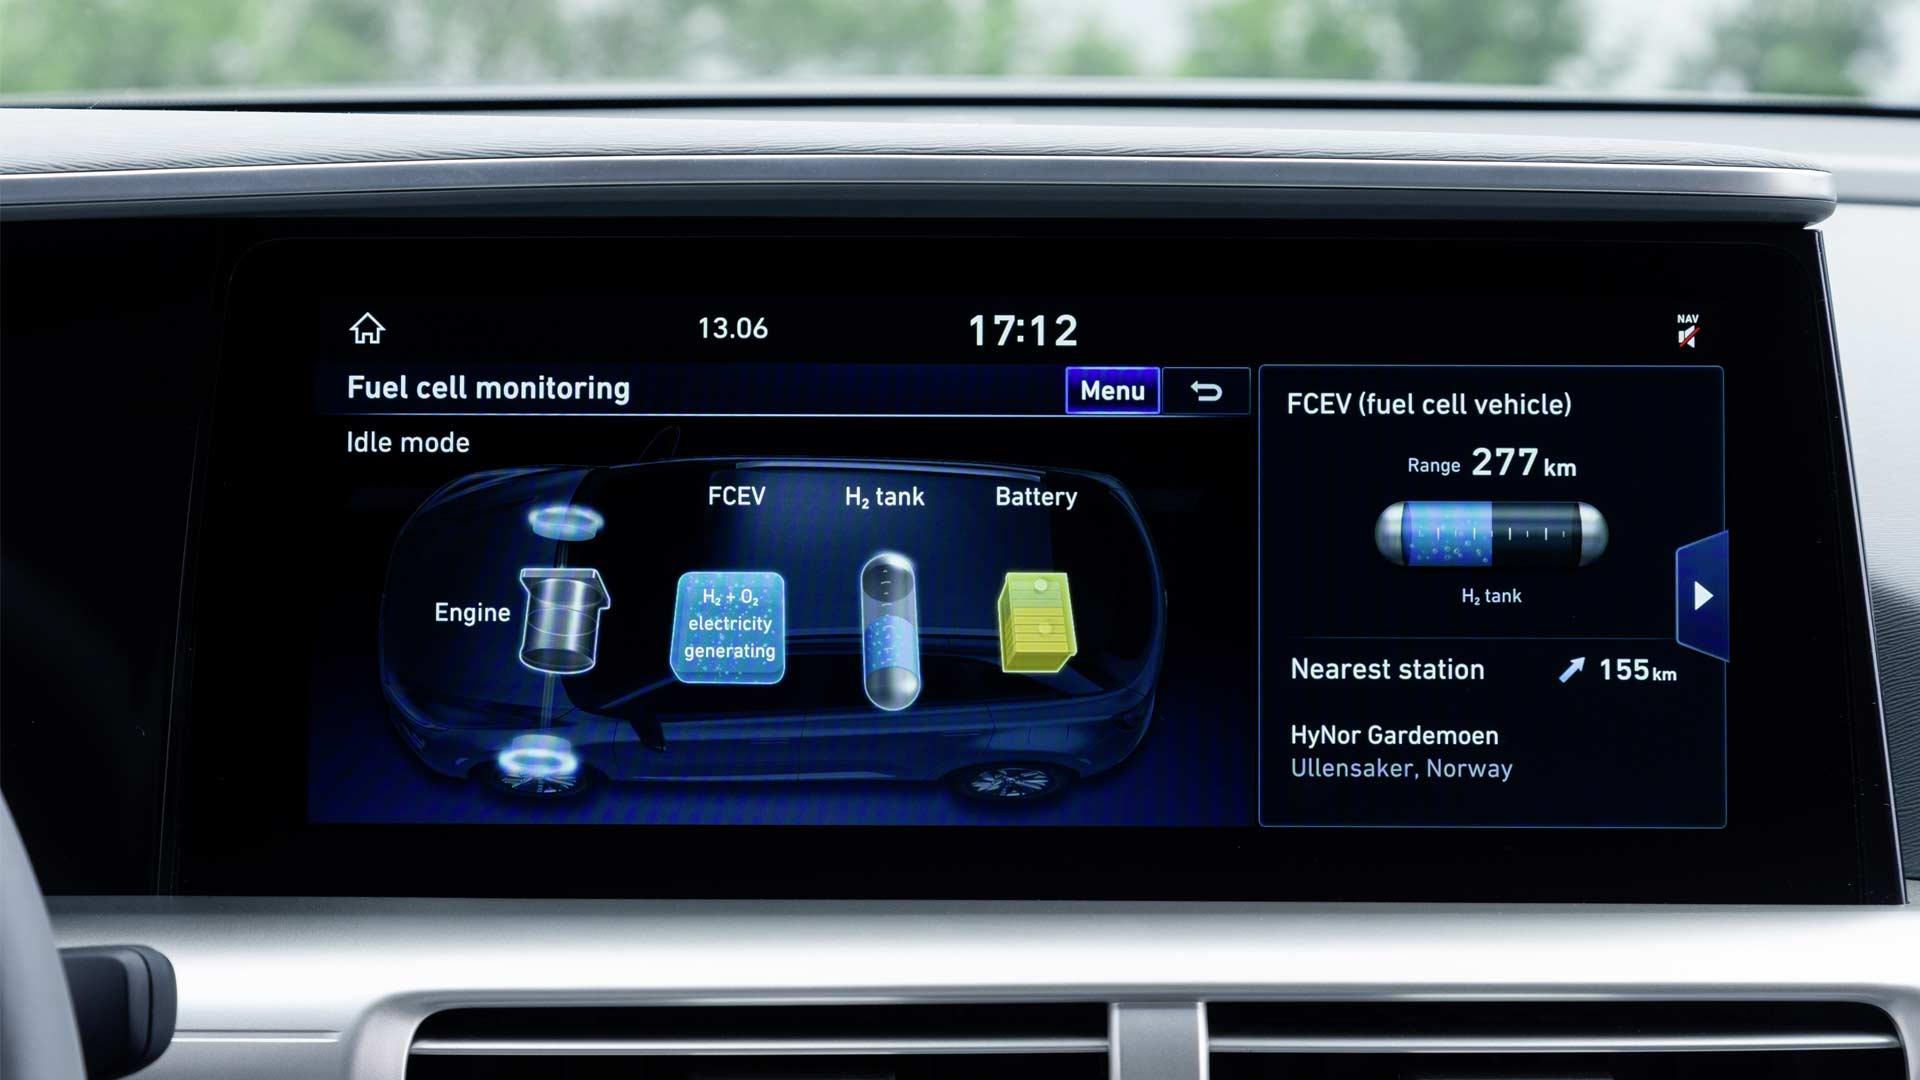 2019-Hyundai-Nexo-fuel-cell-SUV-Interiors_4